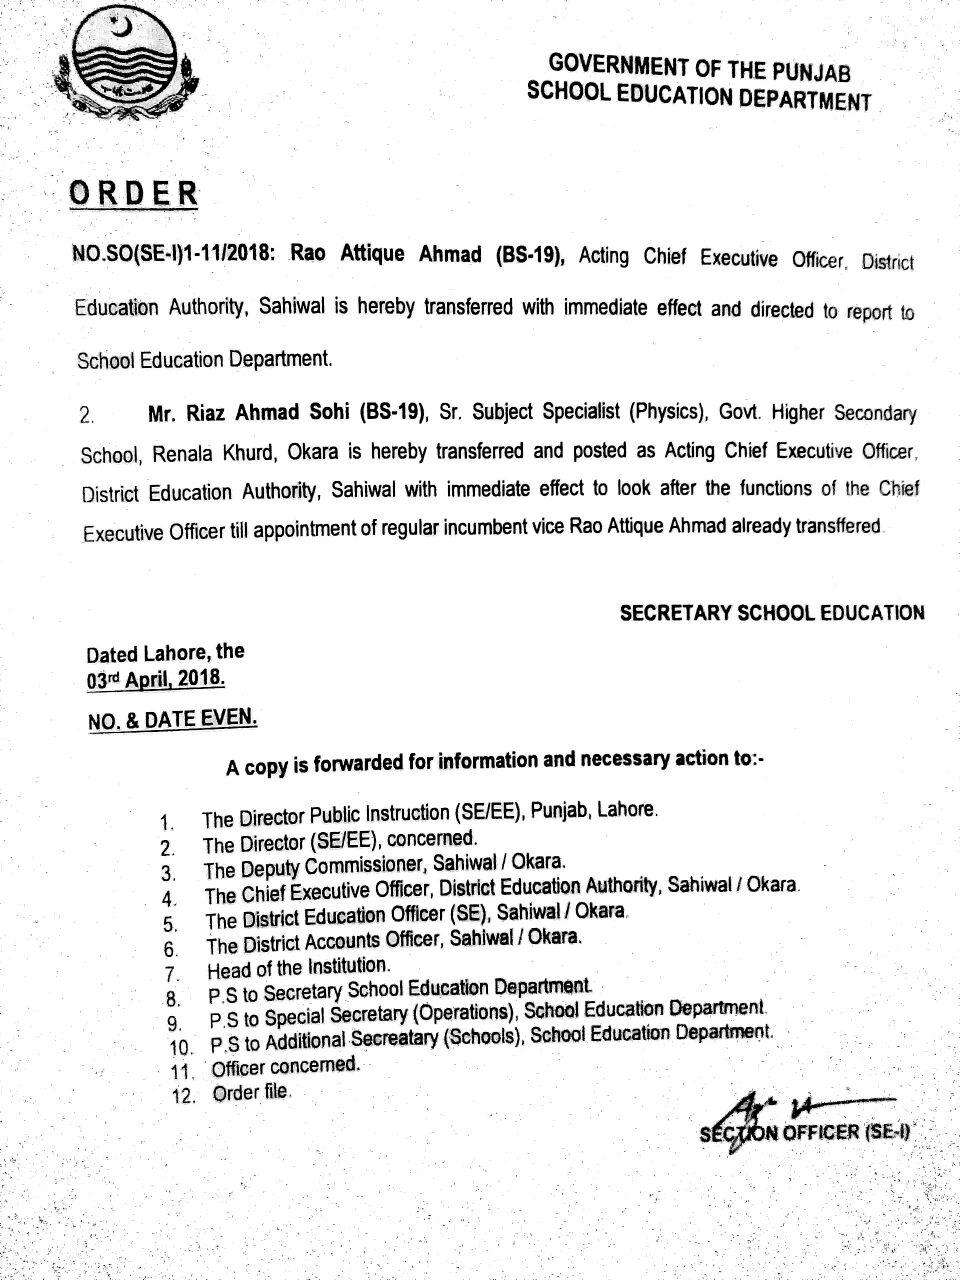 TRANSFER OF RAO ATTIQUE AHMAD & RIAZ AHMAD SOHI IN SCHOOL EDUCATION DEPARTMENT PUNJAB